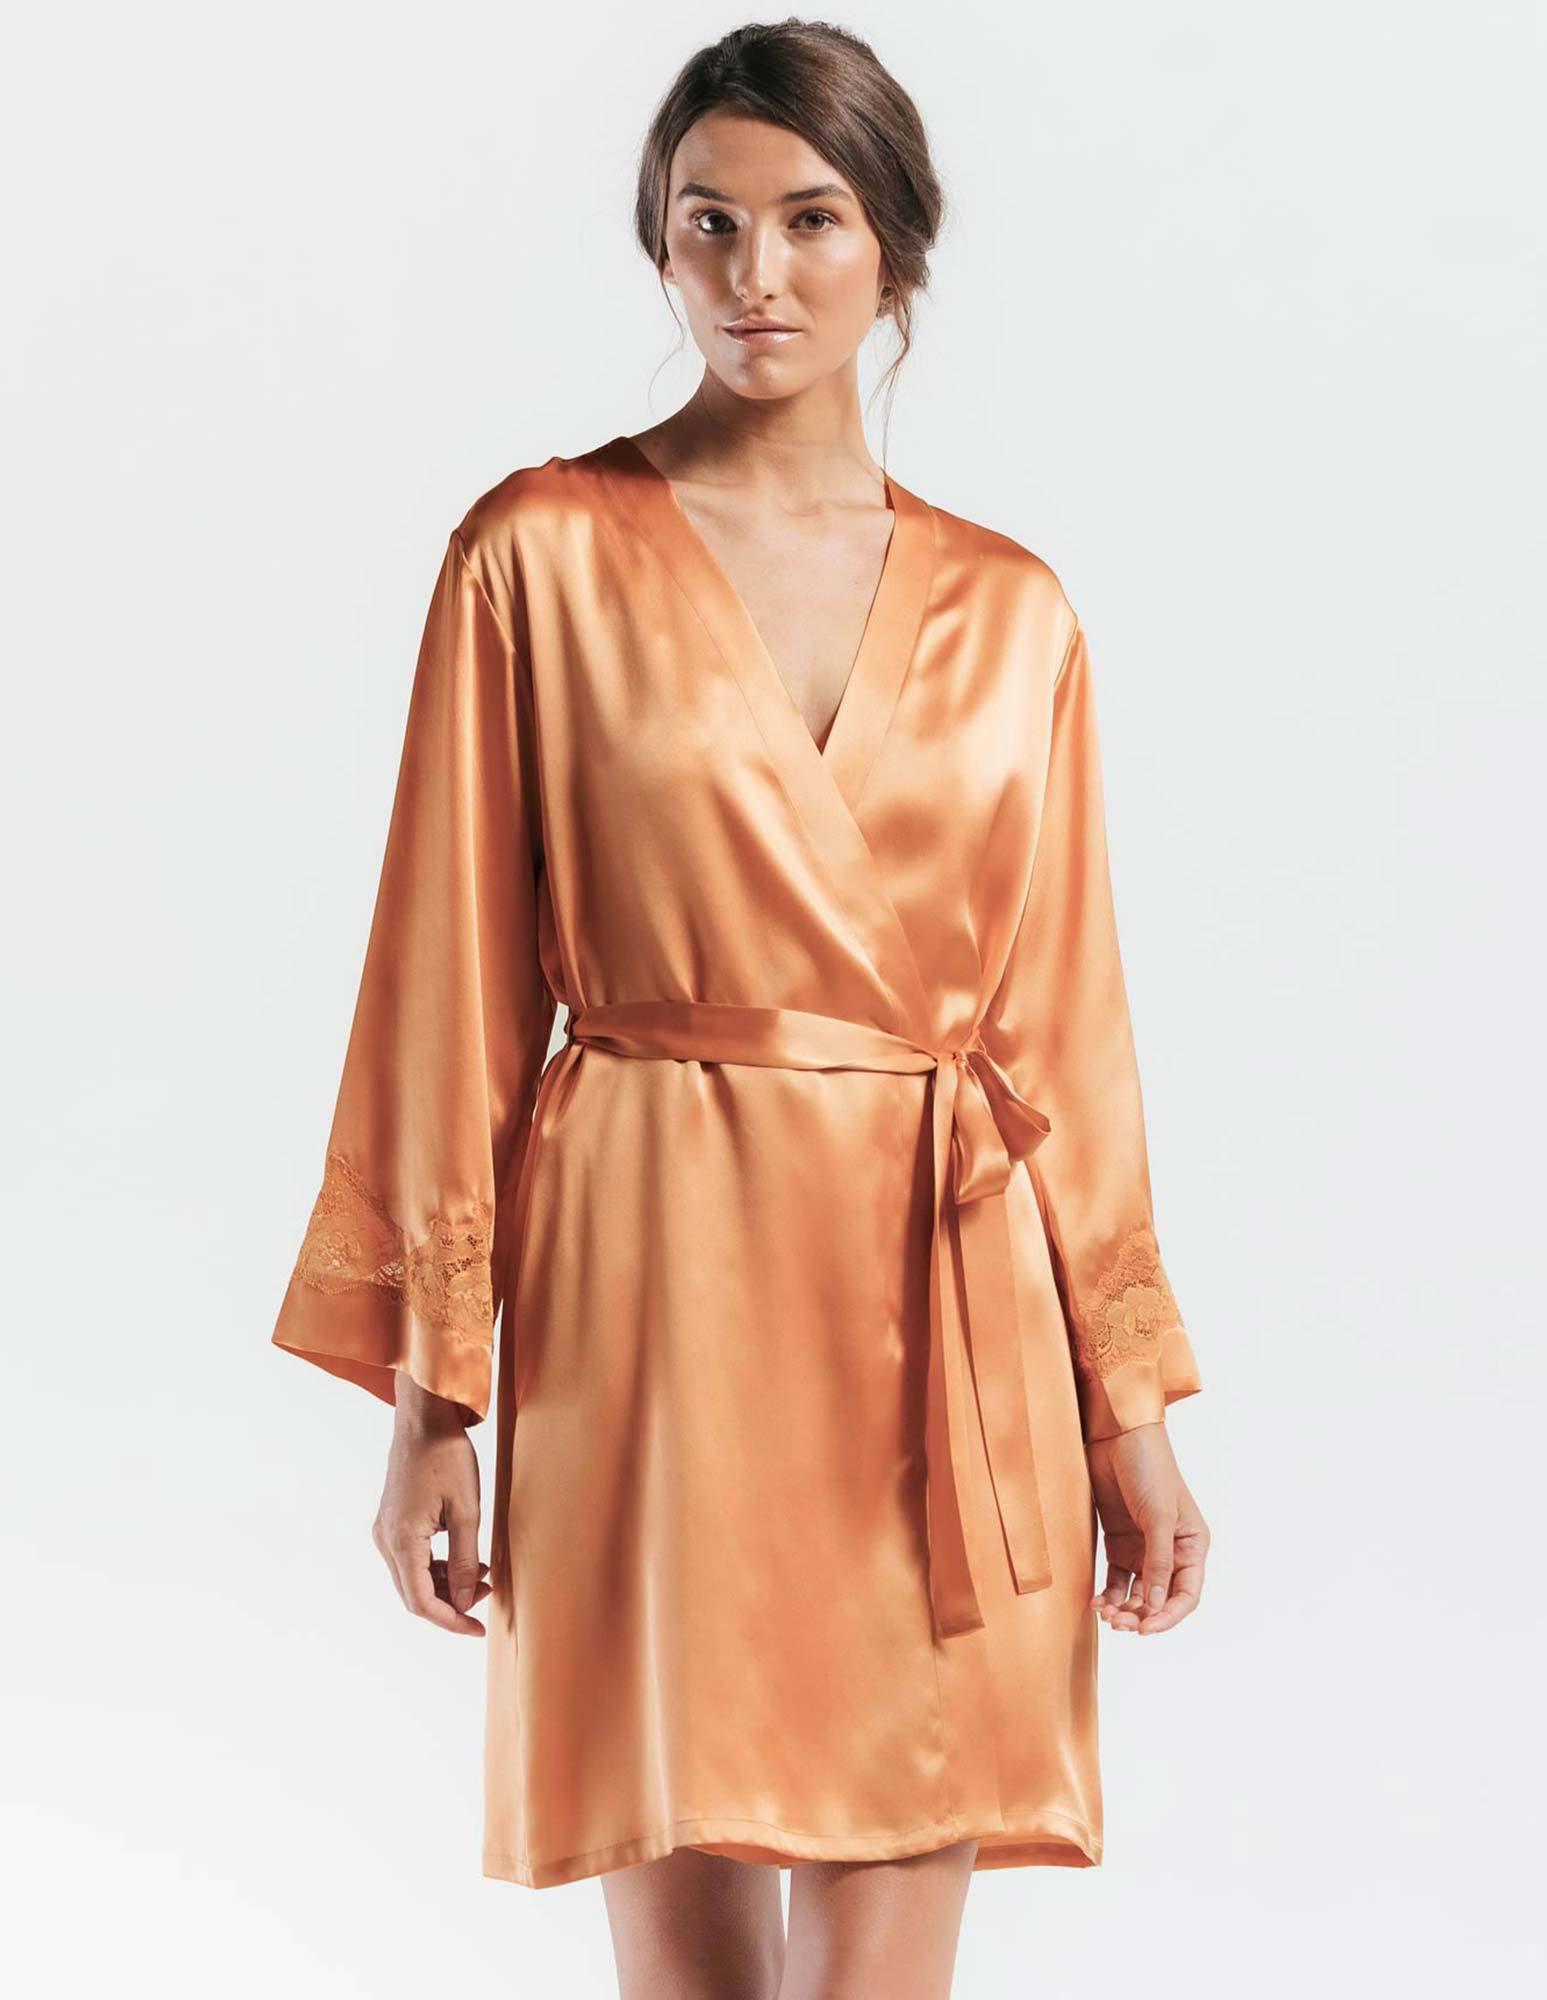 48. Morgan Robe $240. S-L. Peach